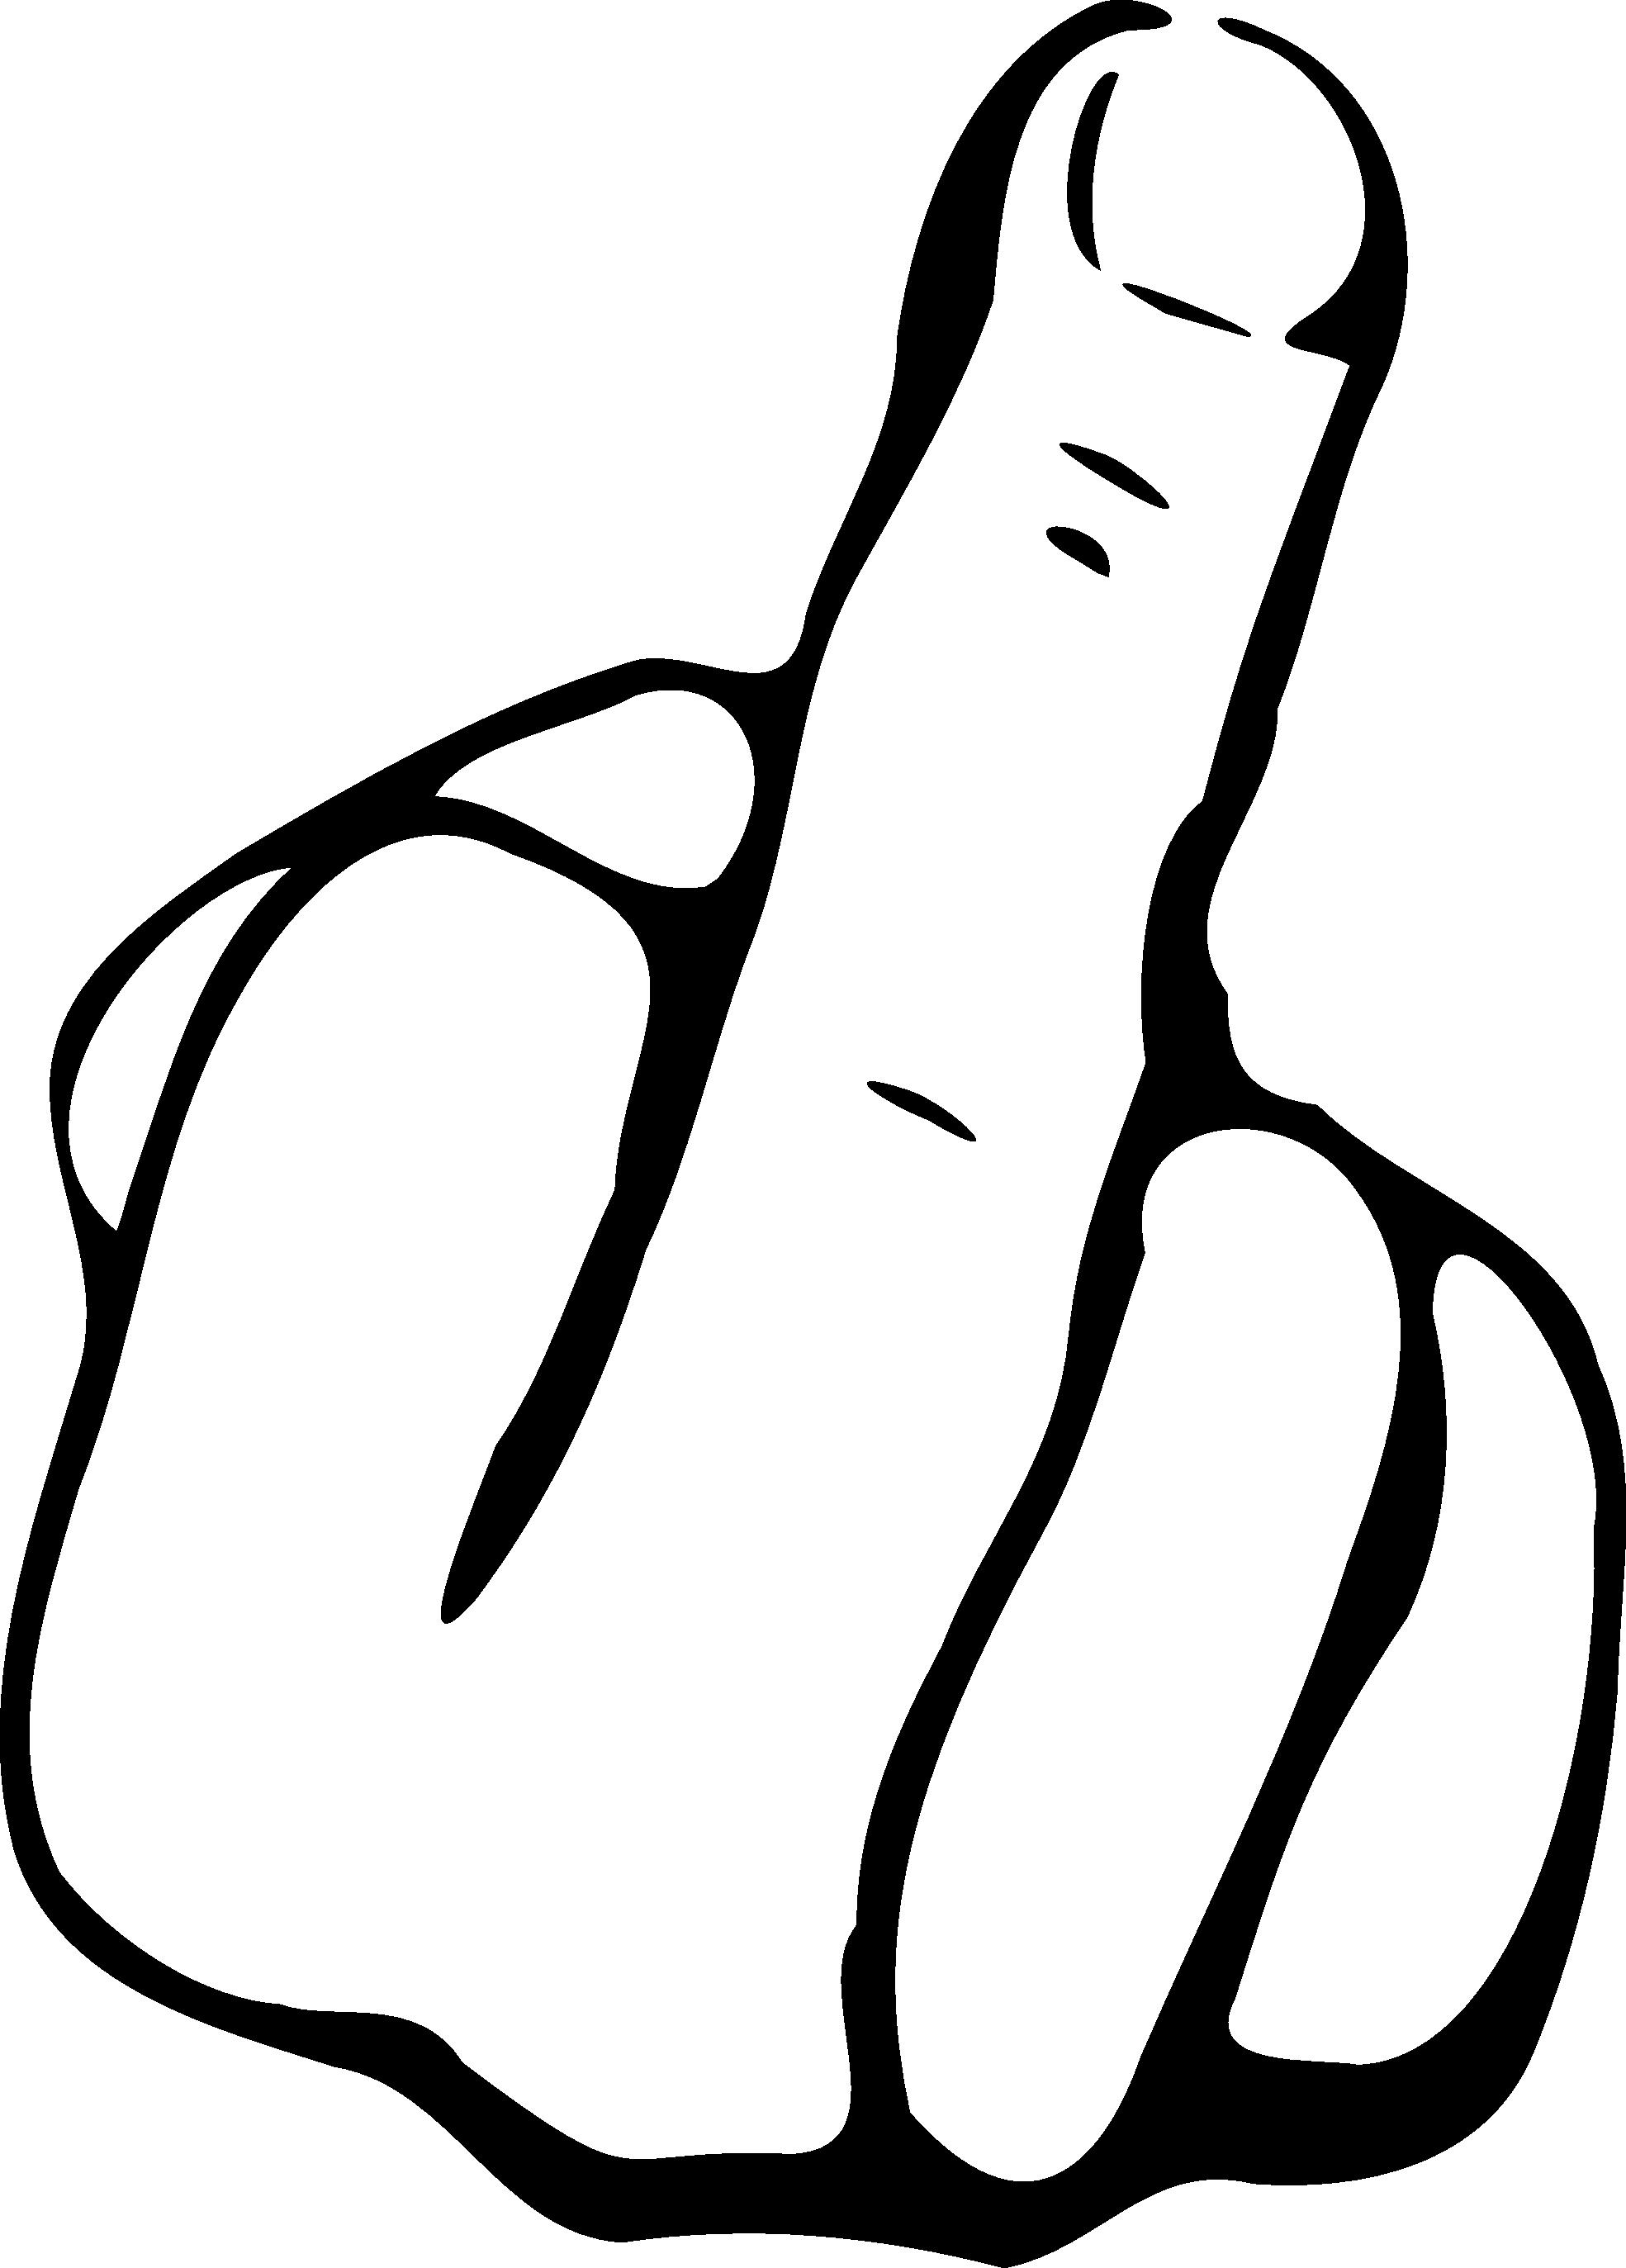 MIDDLE FINGER SIGN - ClipArt Best